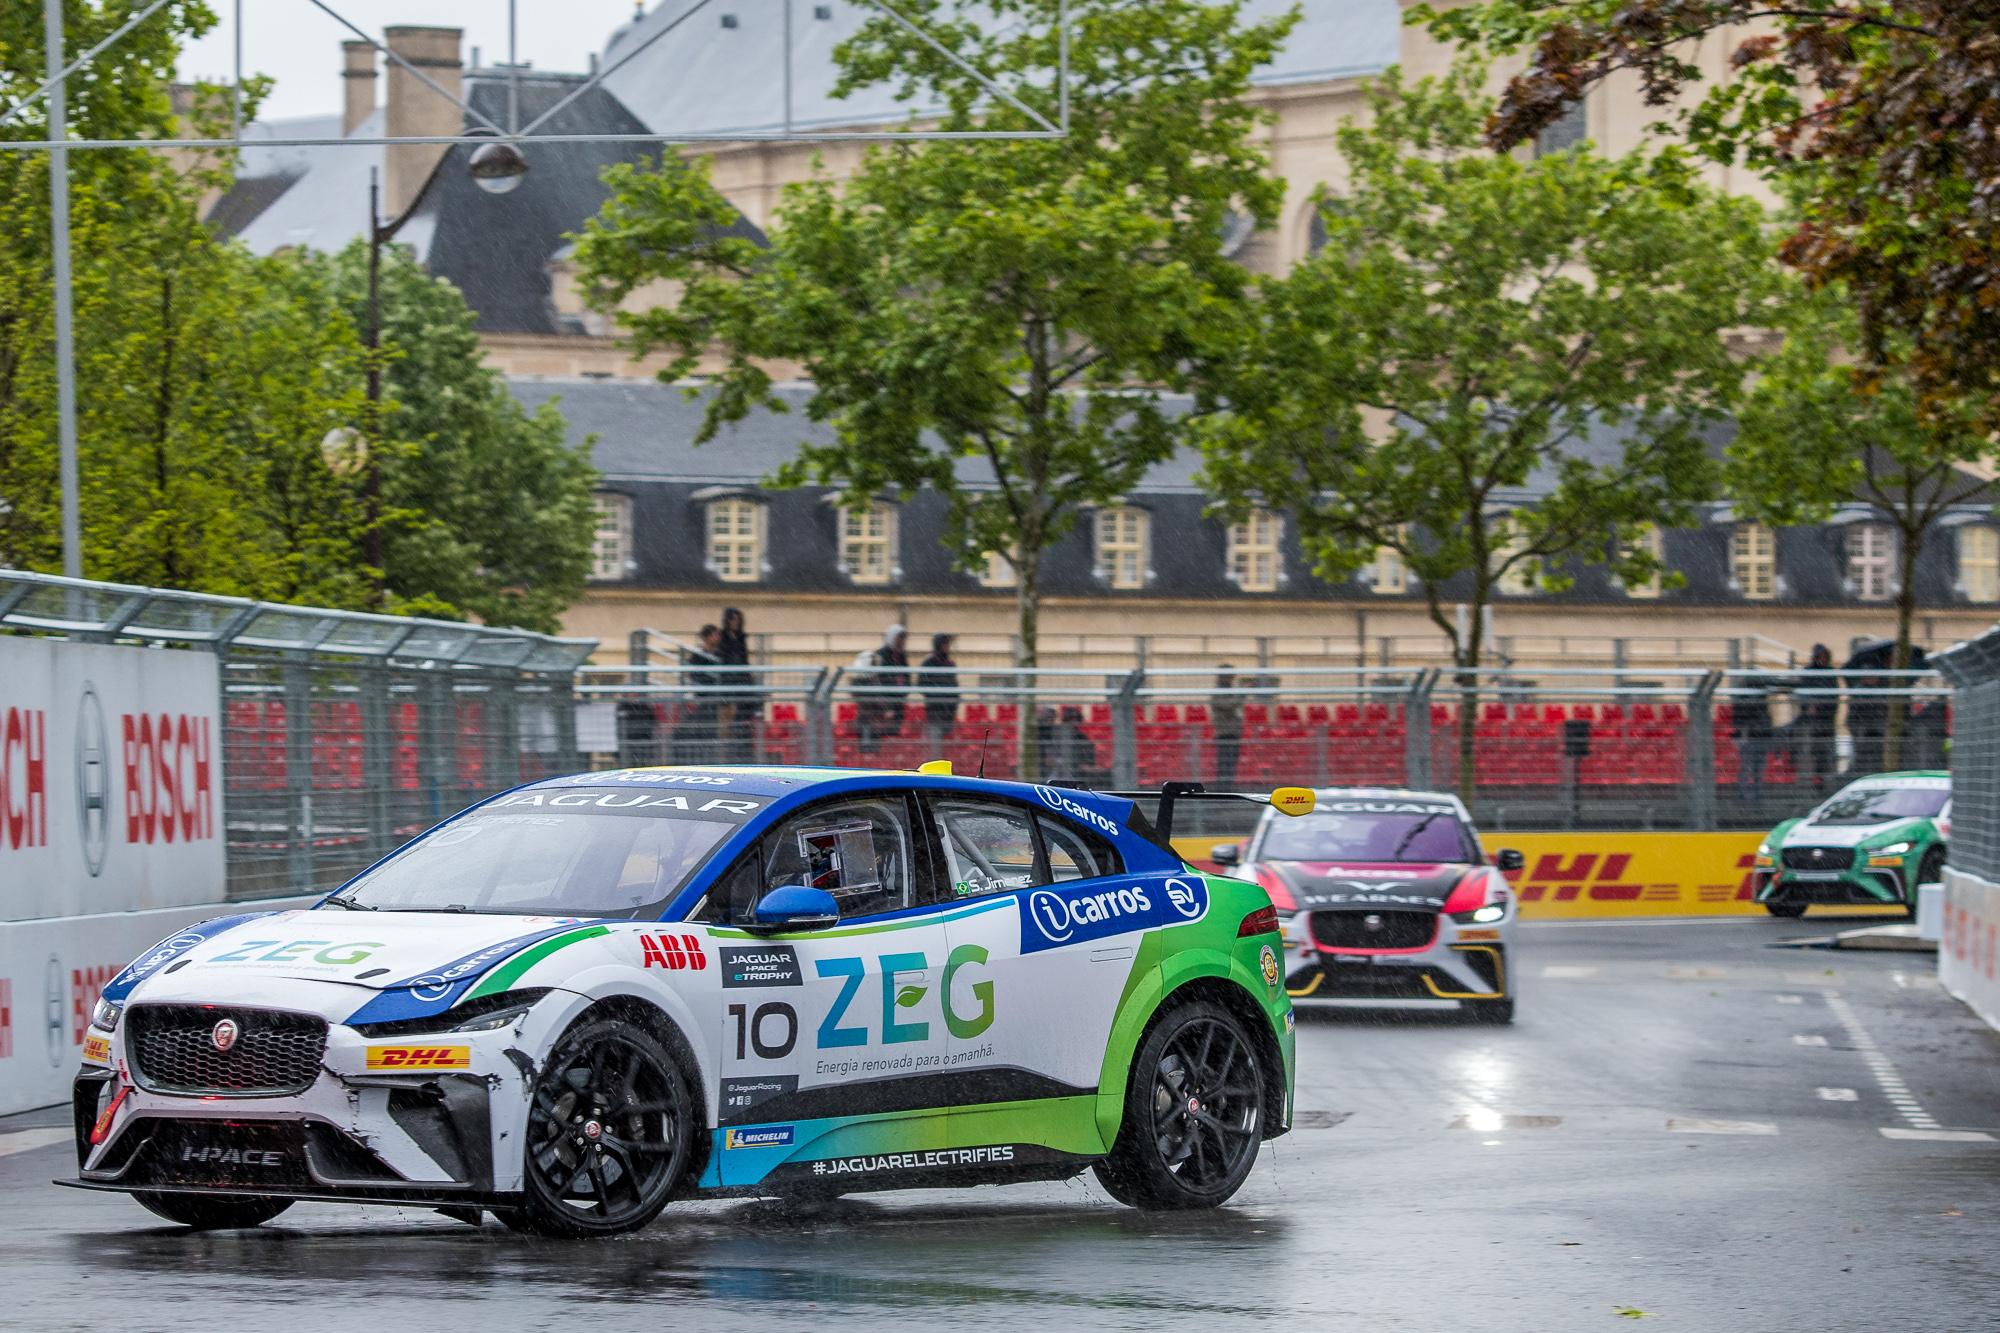 Jaguar_6.Paris_josemariodias_08023-2